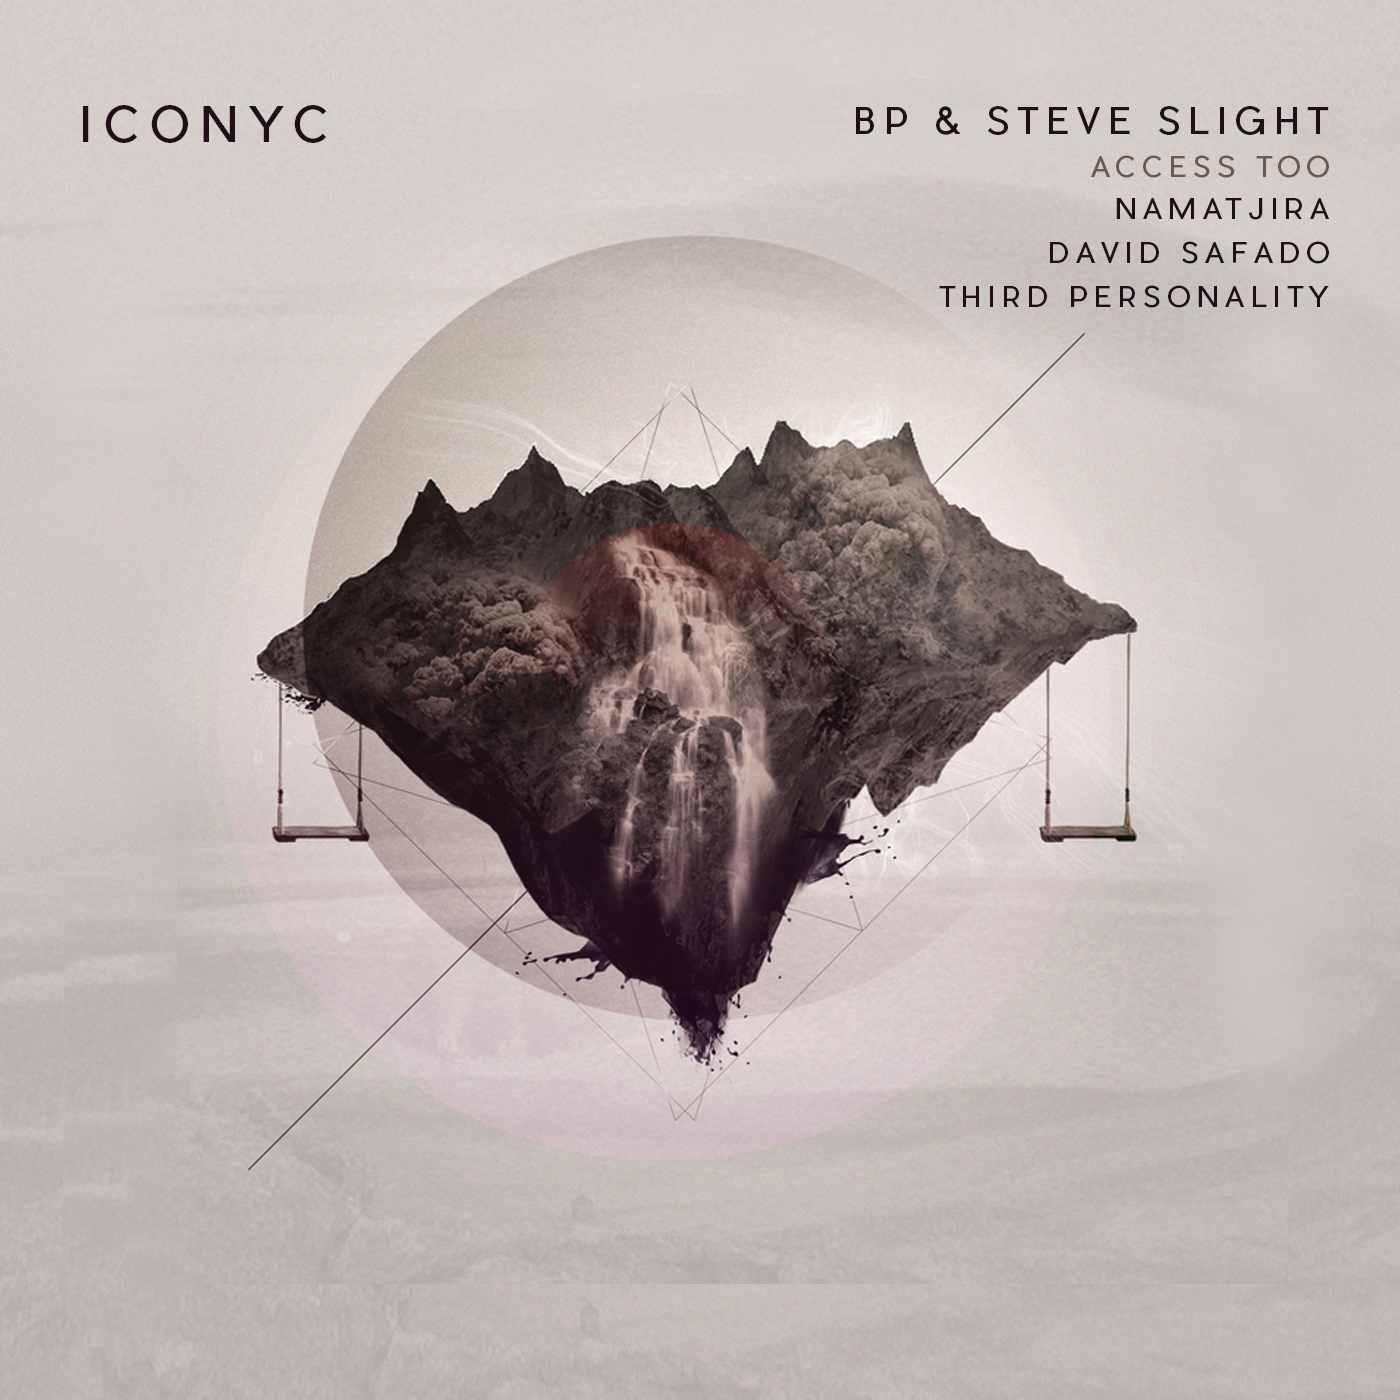 BP & Steve Slight - Access To (ICONYC)